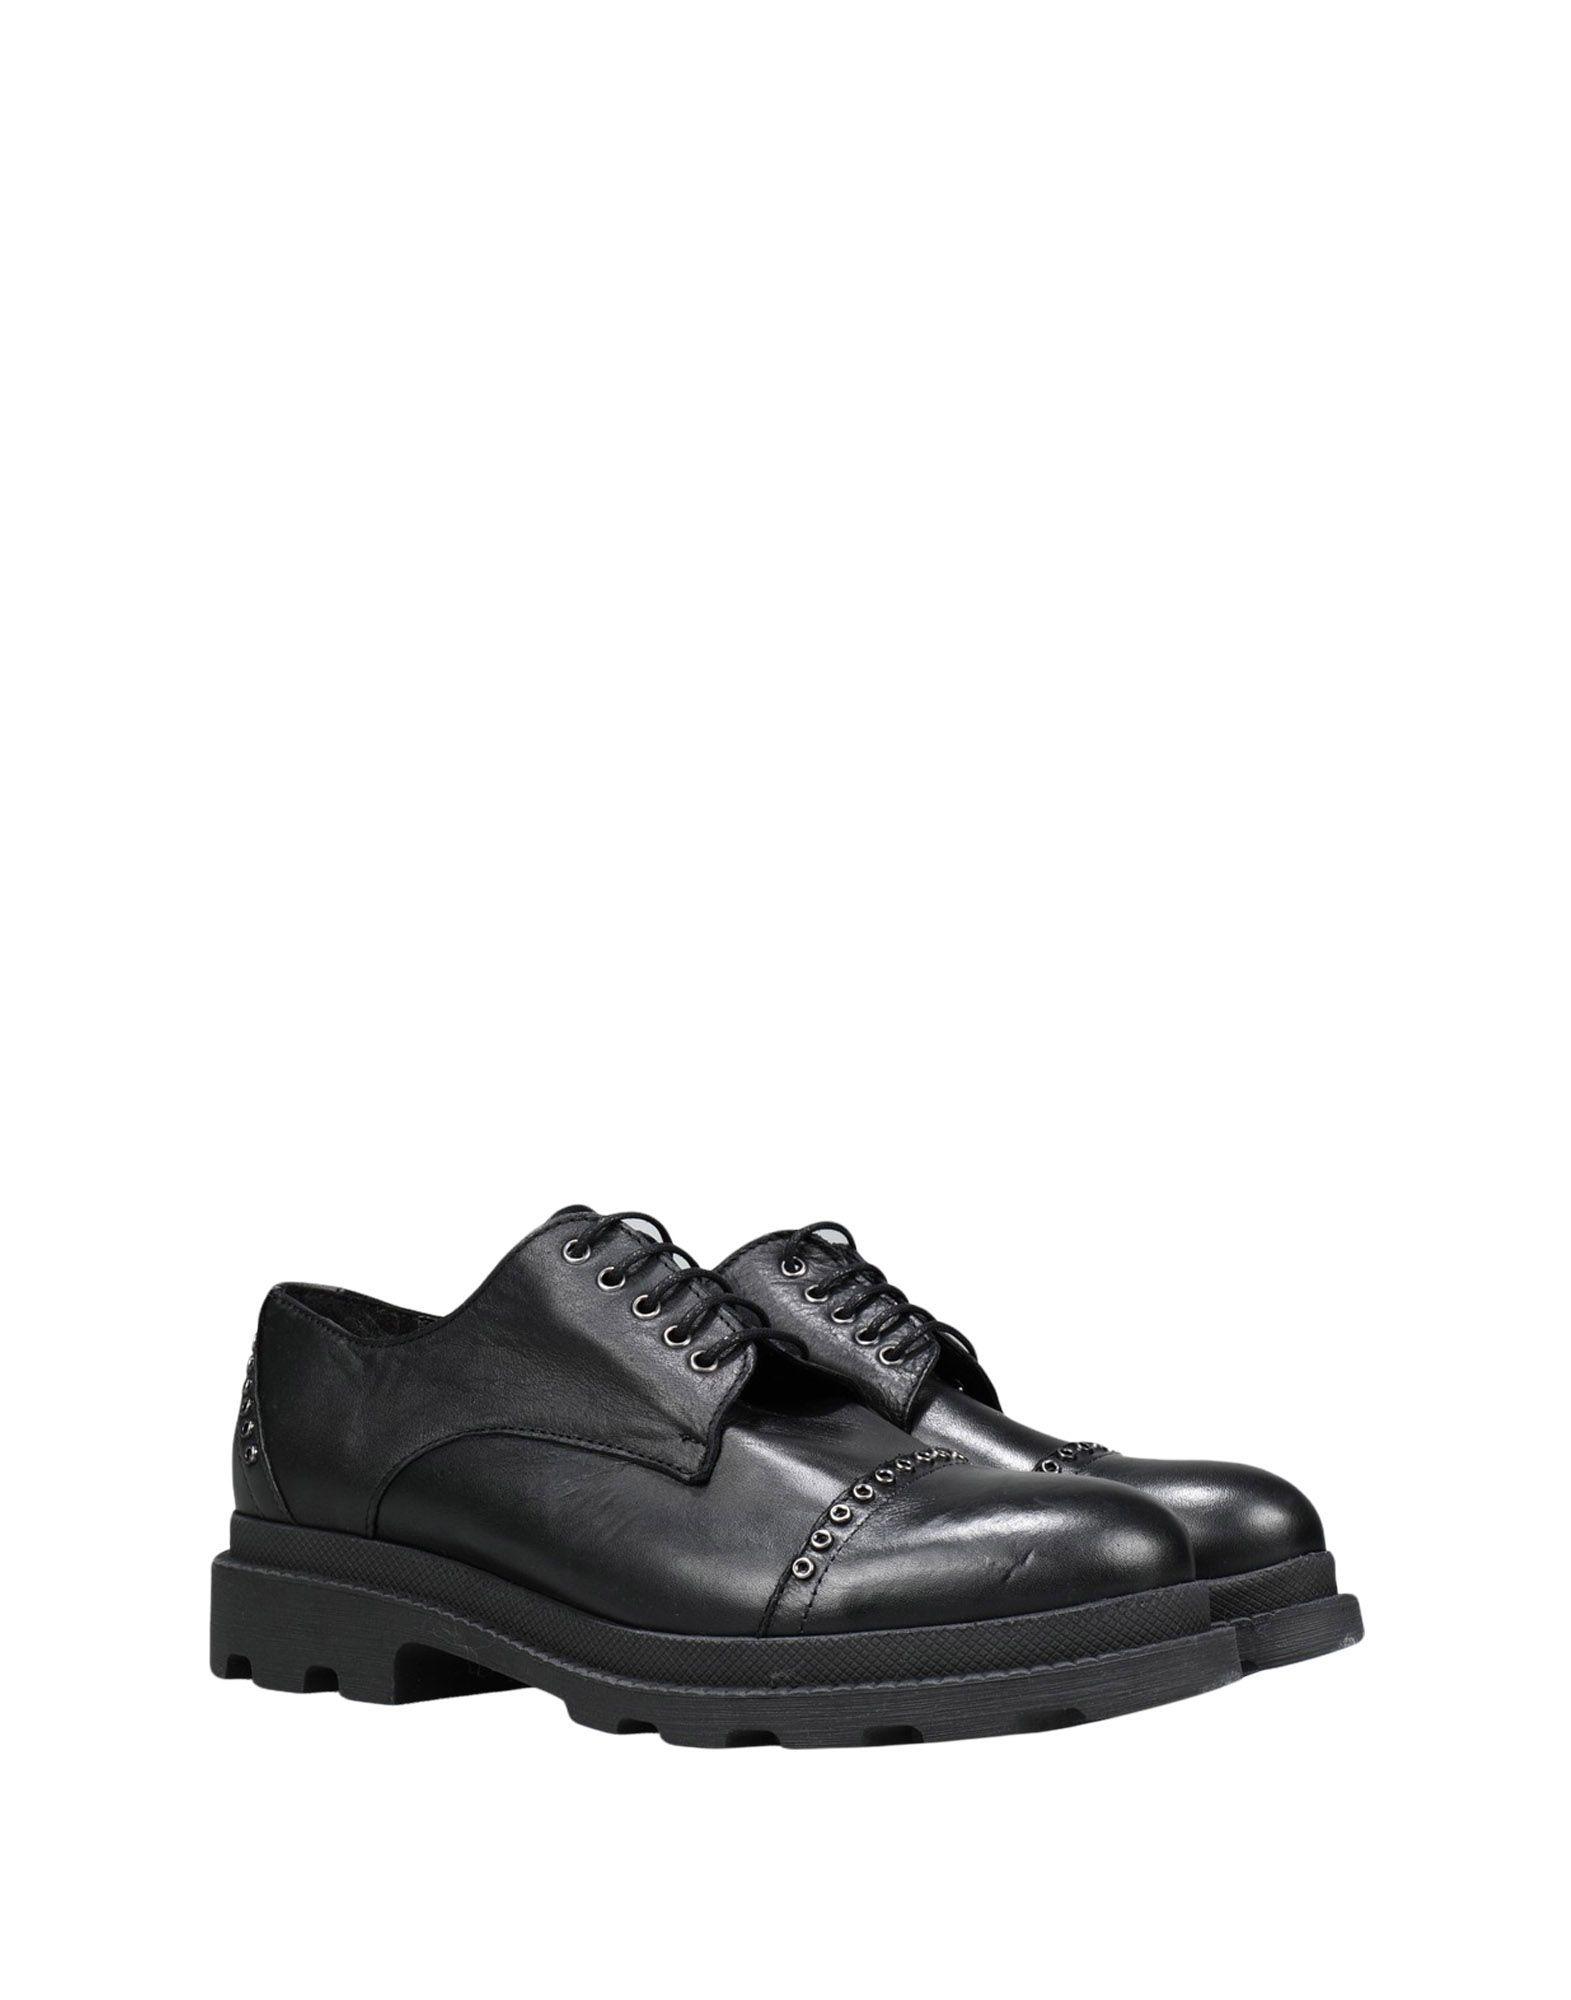 Carmine Marfé  Schnürschuhe Damen  Marfé 11525760BH Neue Schuhe b8935e